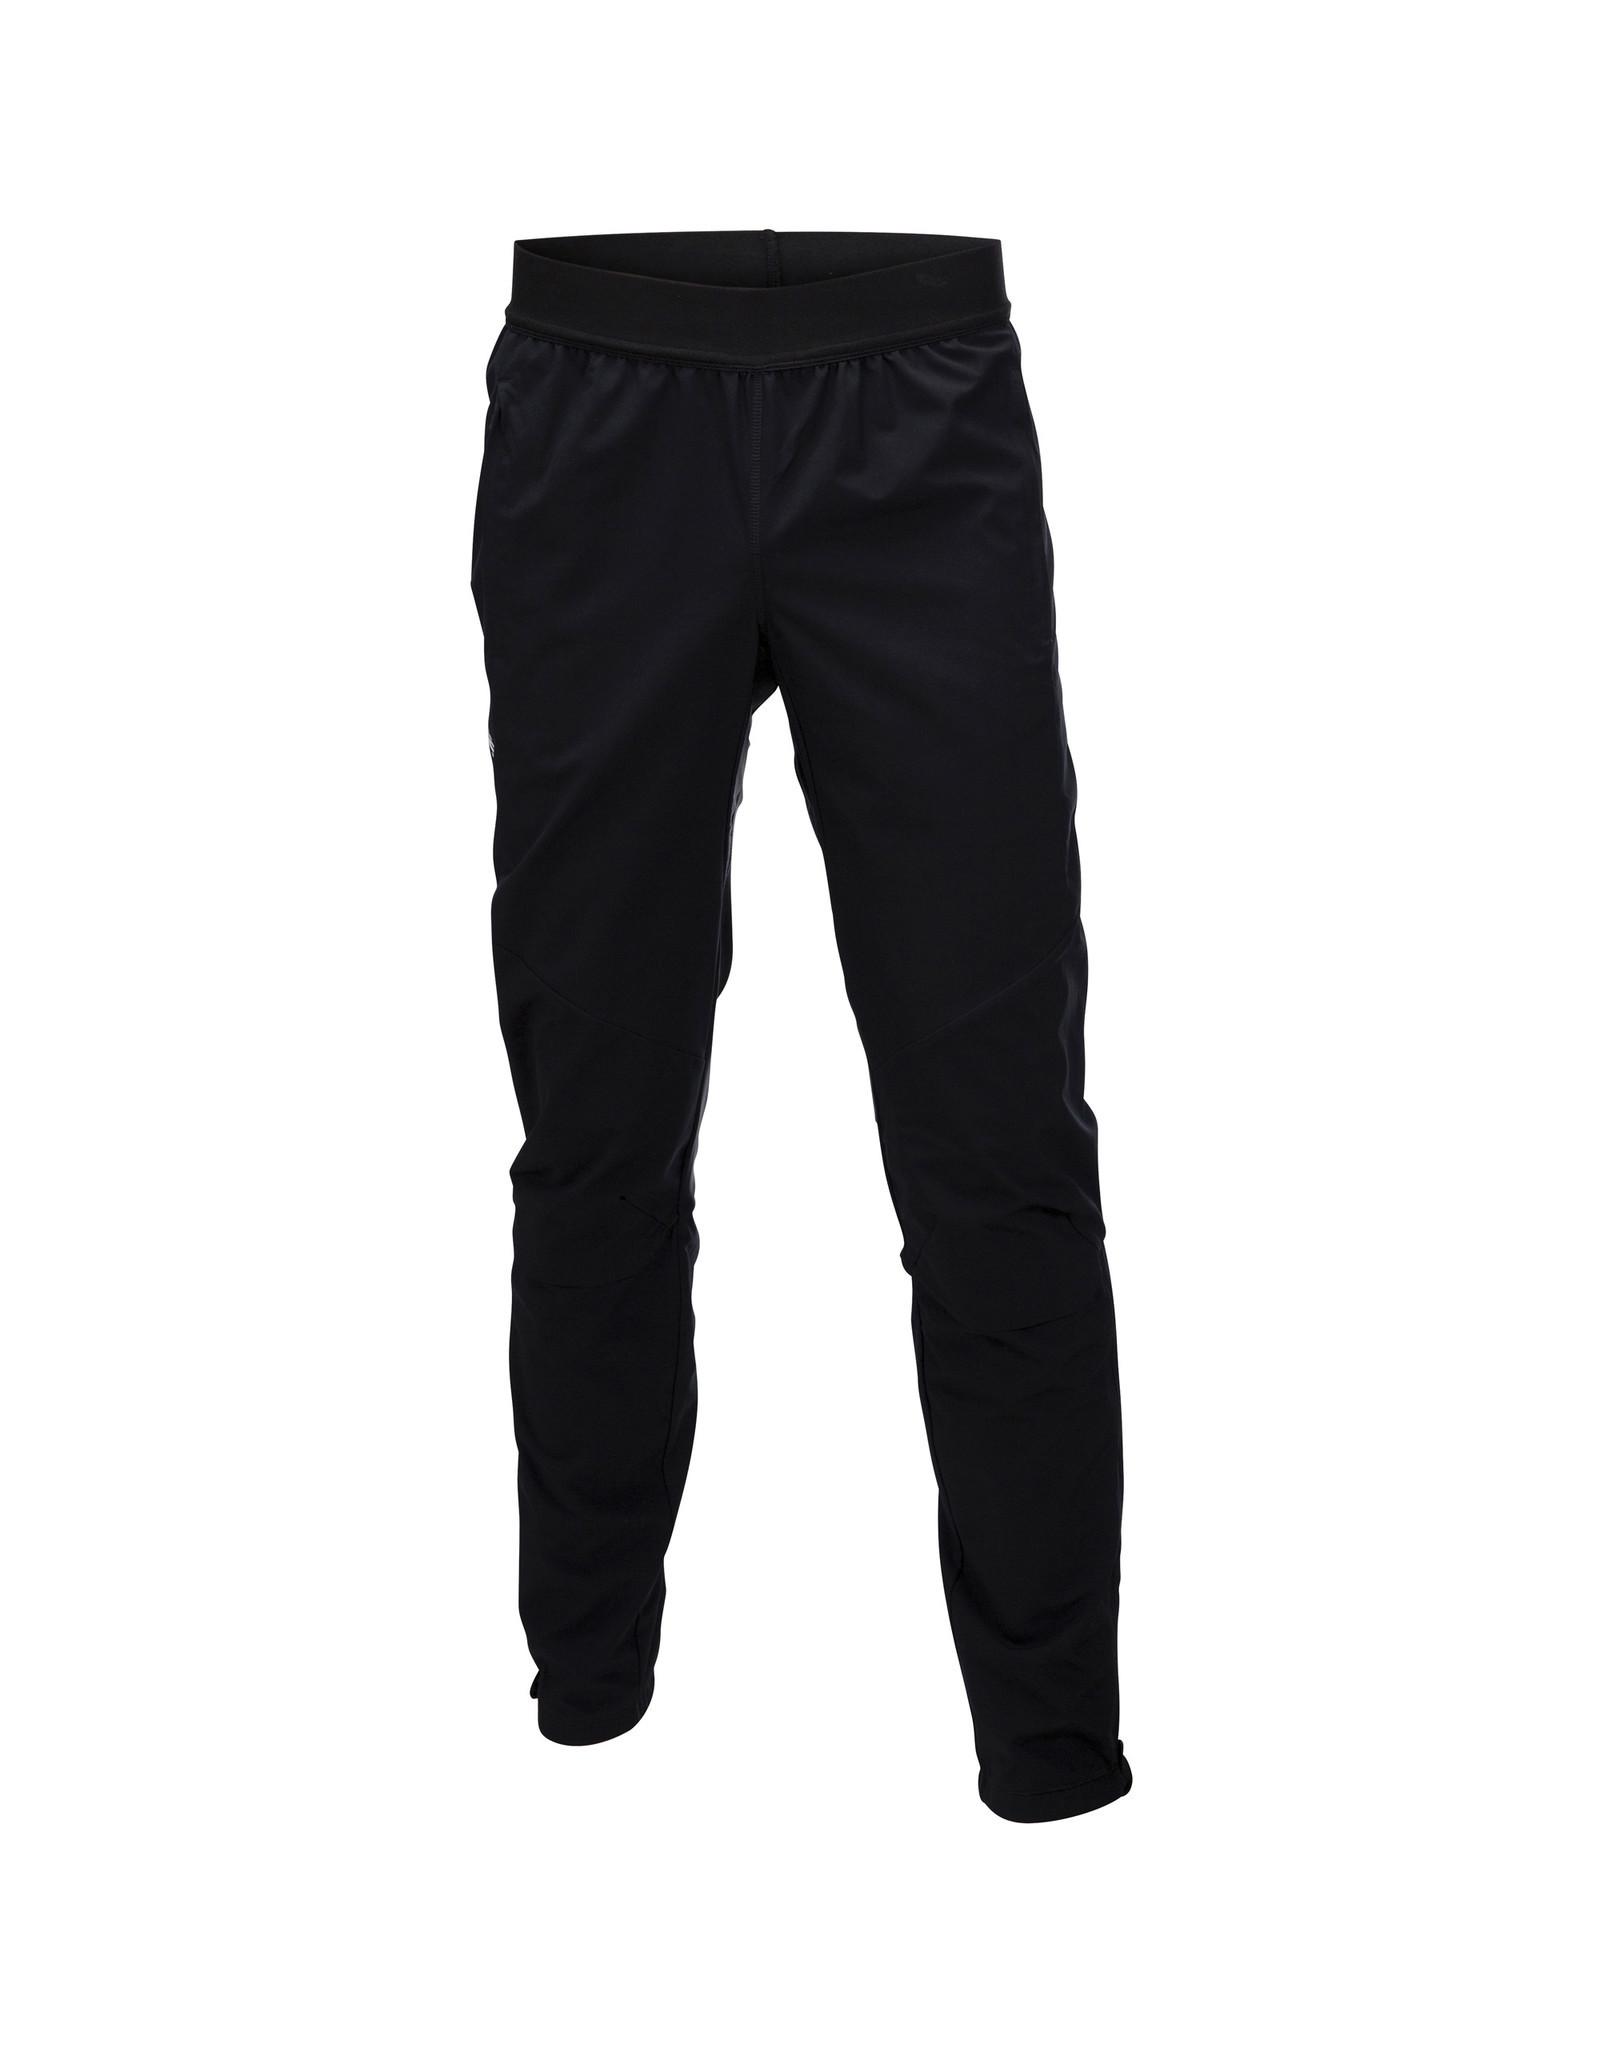 Swix Star XC Pants Mens S (10000) Black